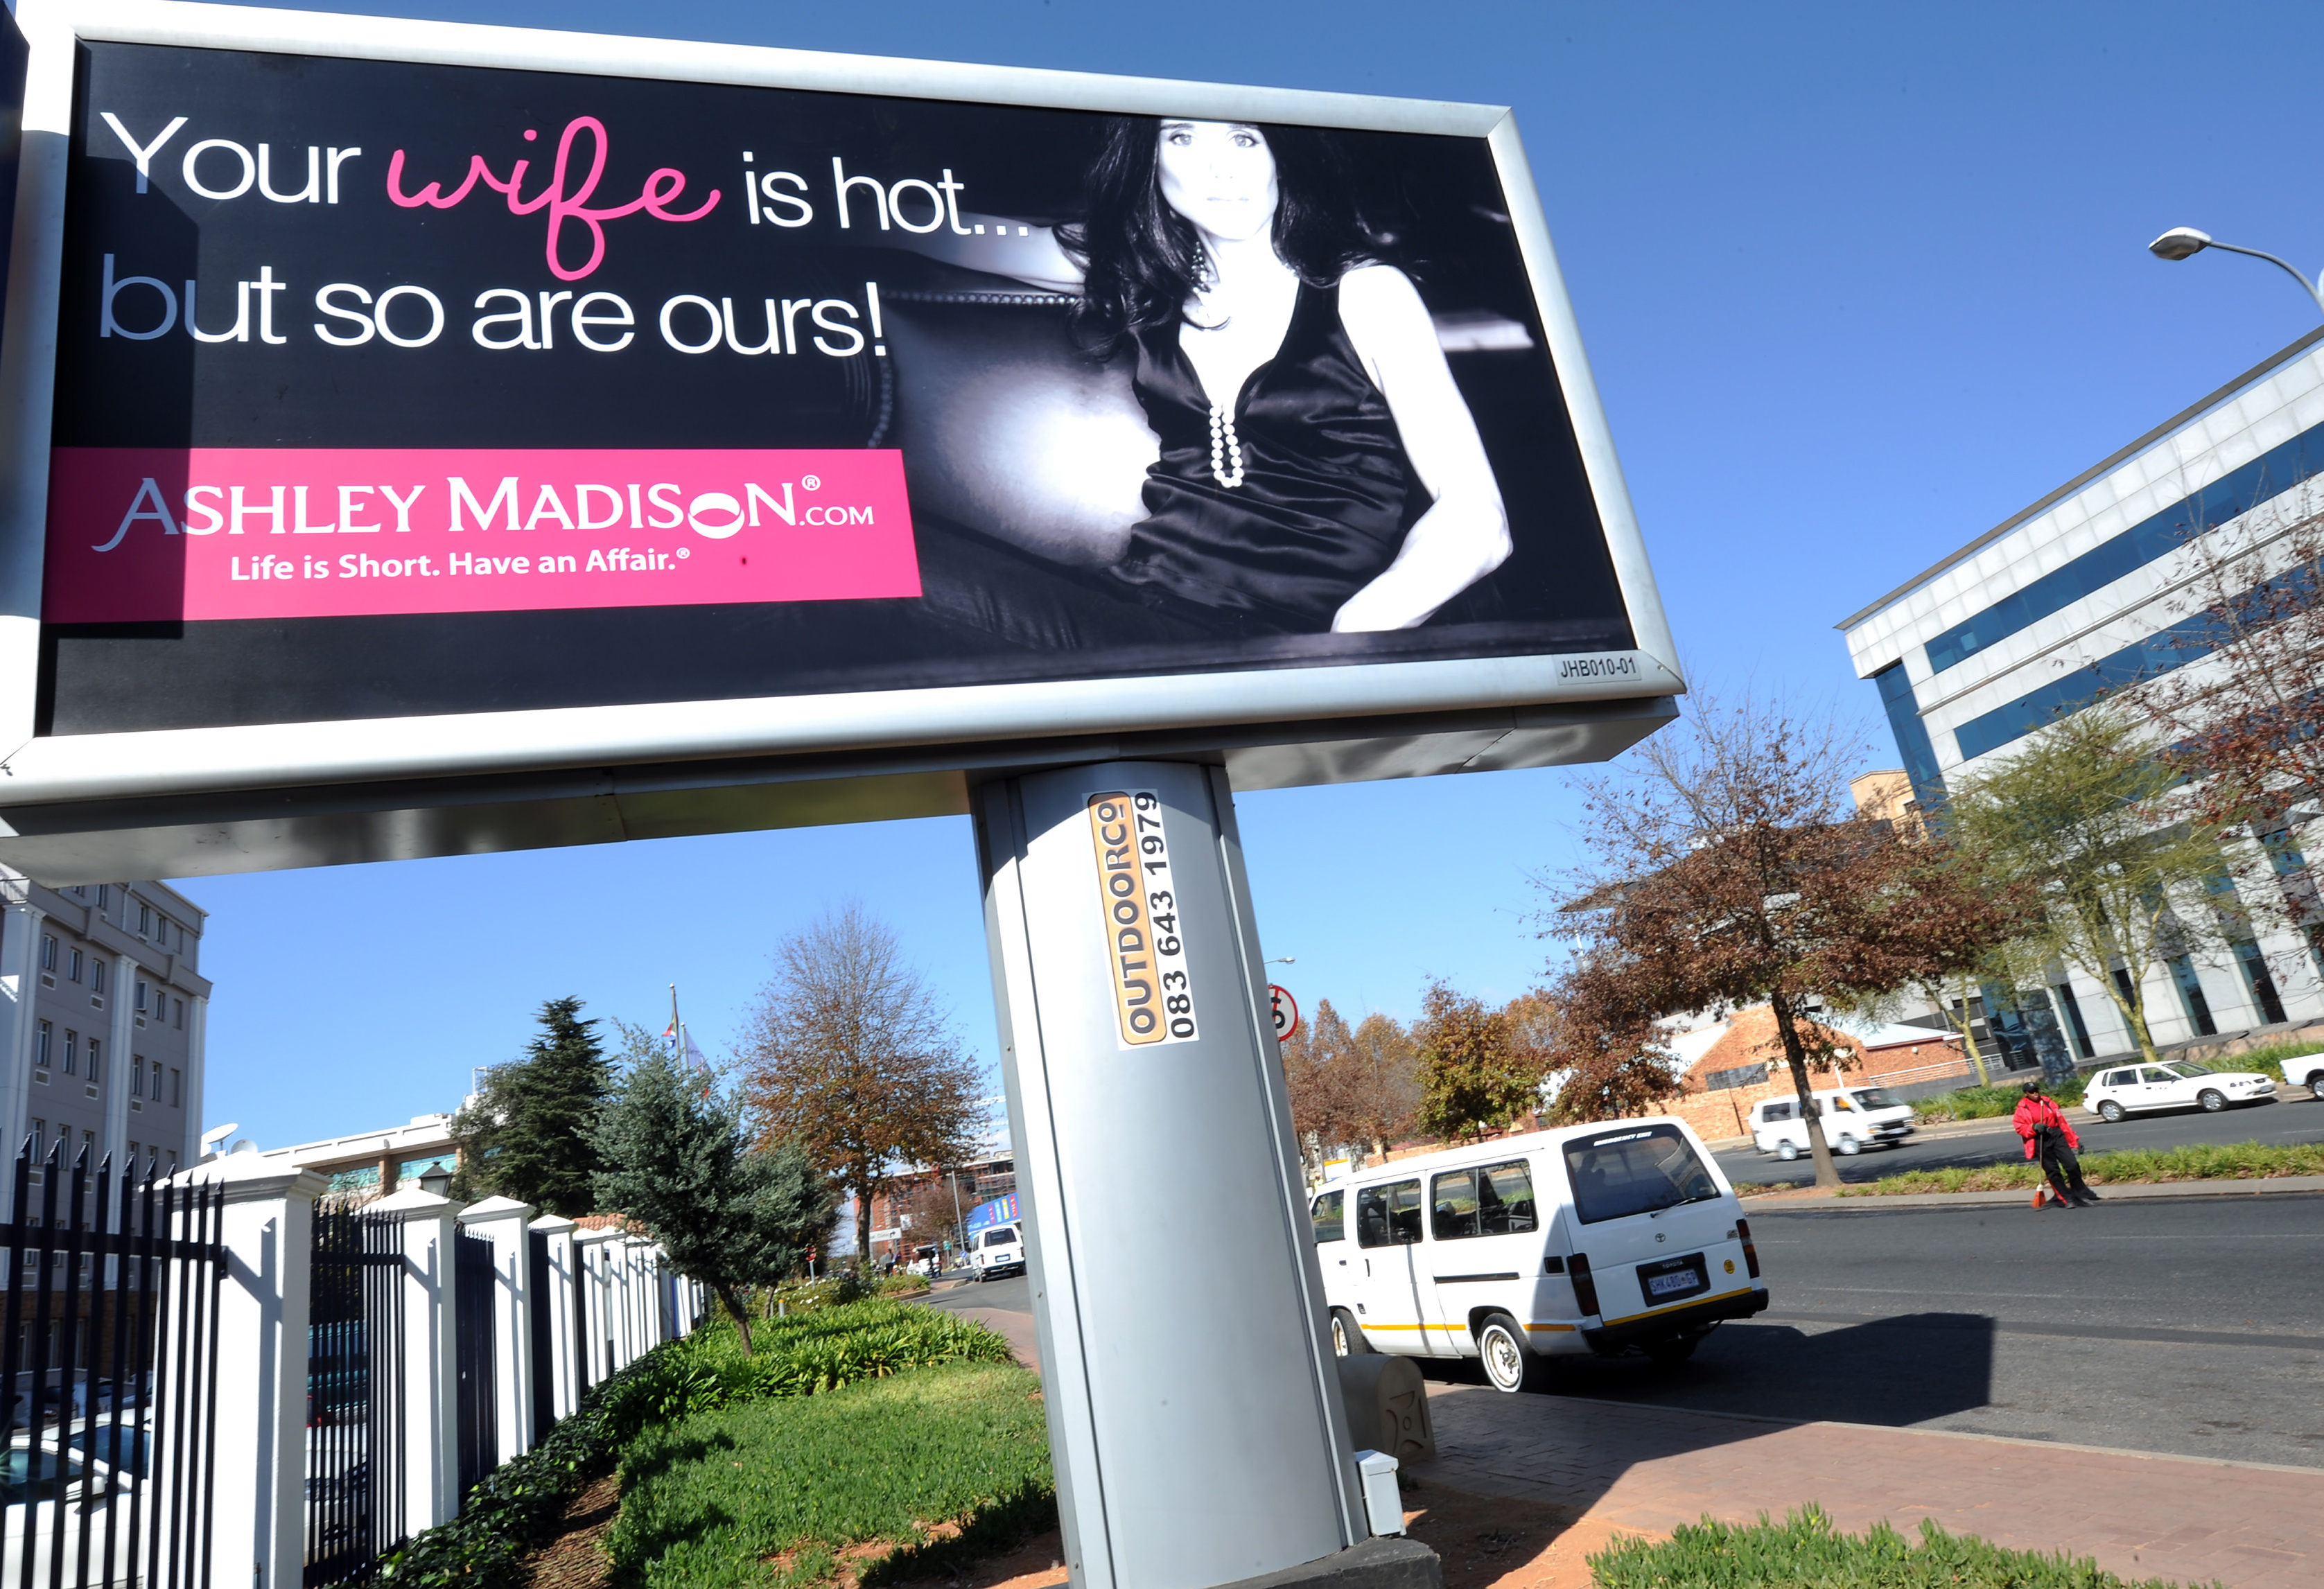 A billboard is displayed advertising online-affair website 'AshleyMadison.com' on June 6, 2012 in Johannesburg, South Africa.